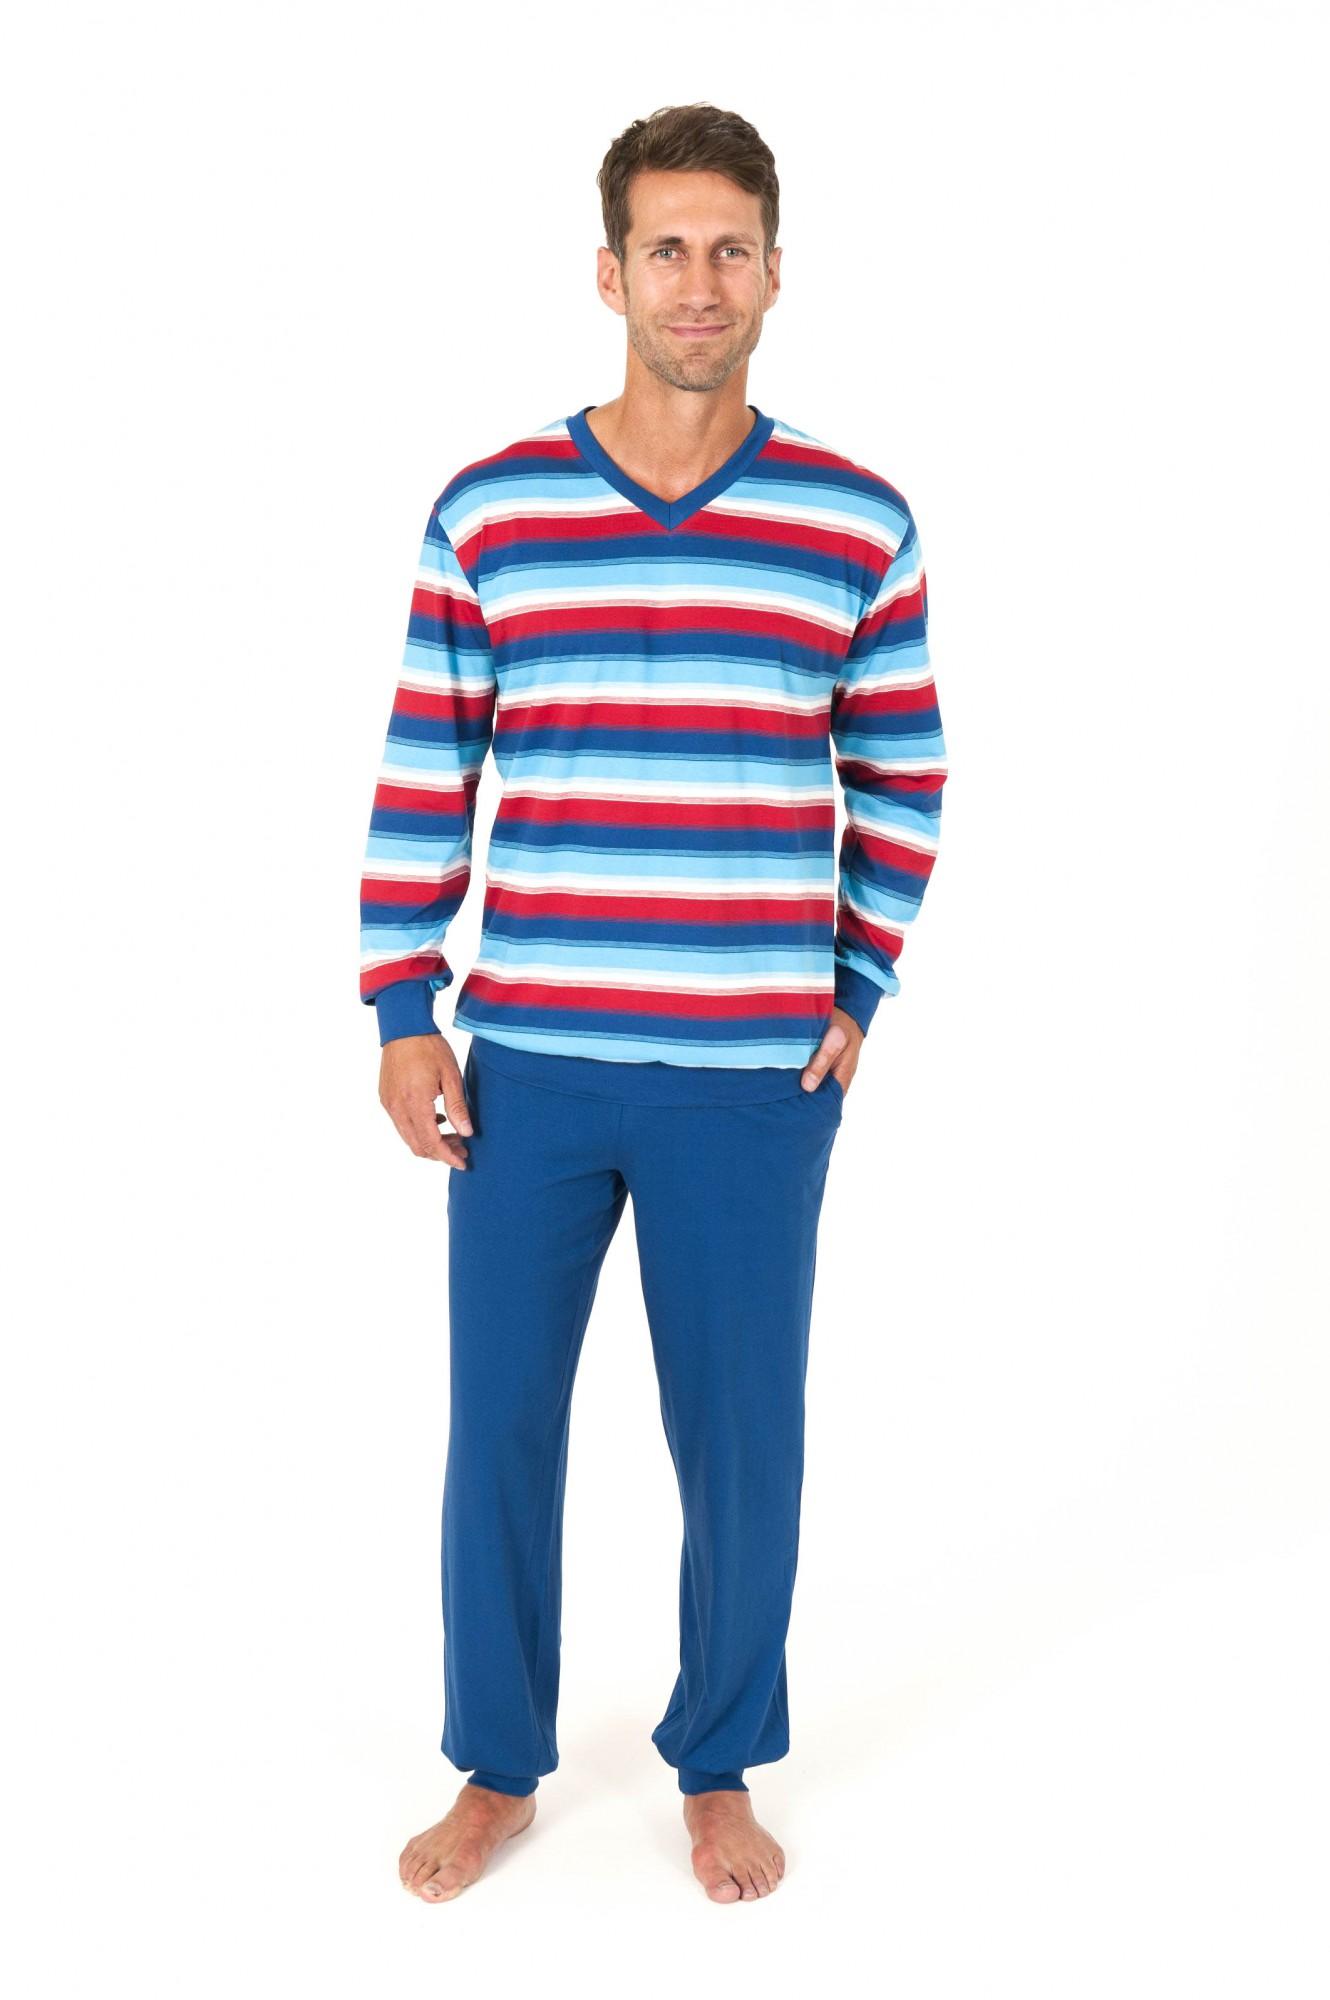 Herren Pyjama langarm mit Bündchen Ringel Optik – 161 101 90 705 001